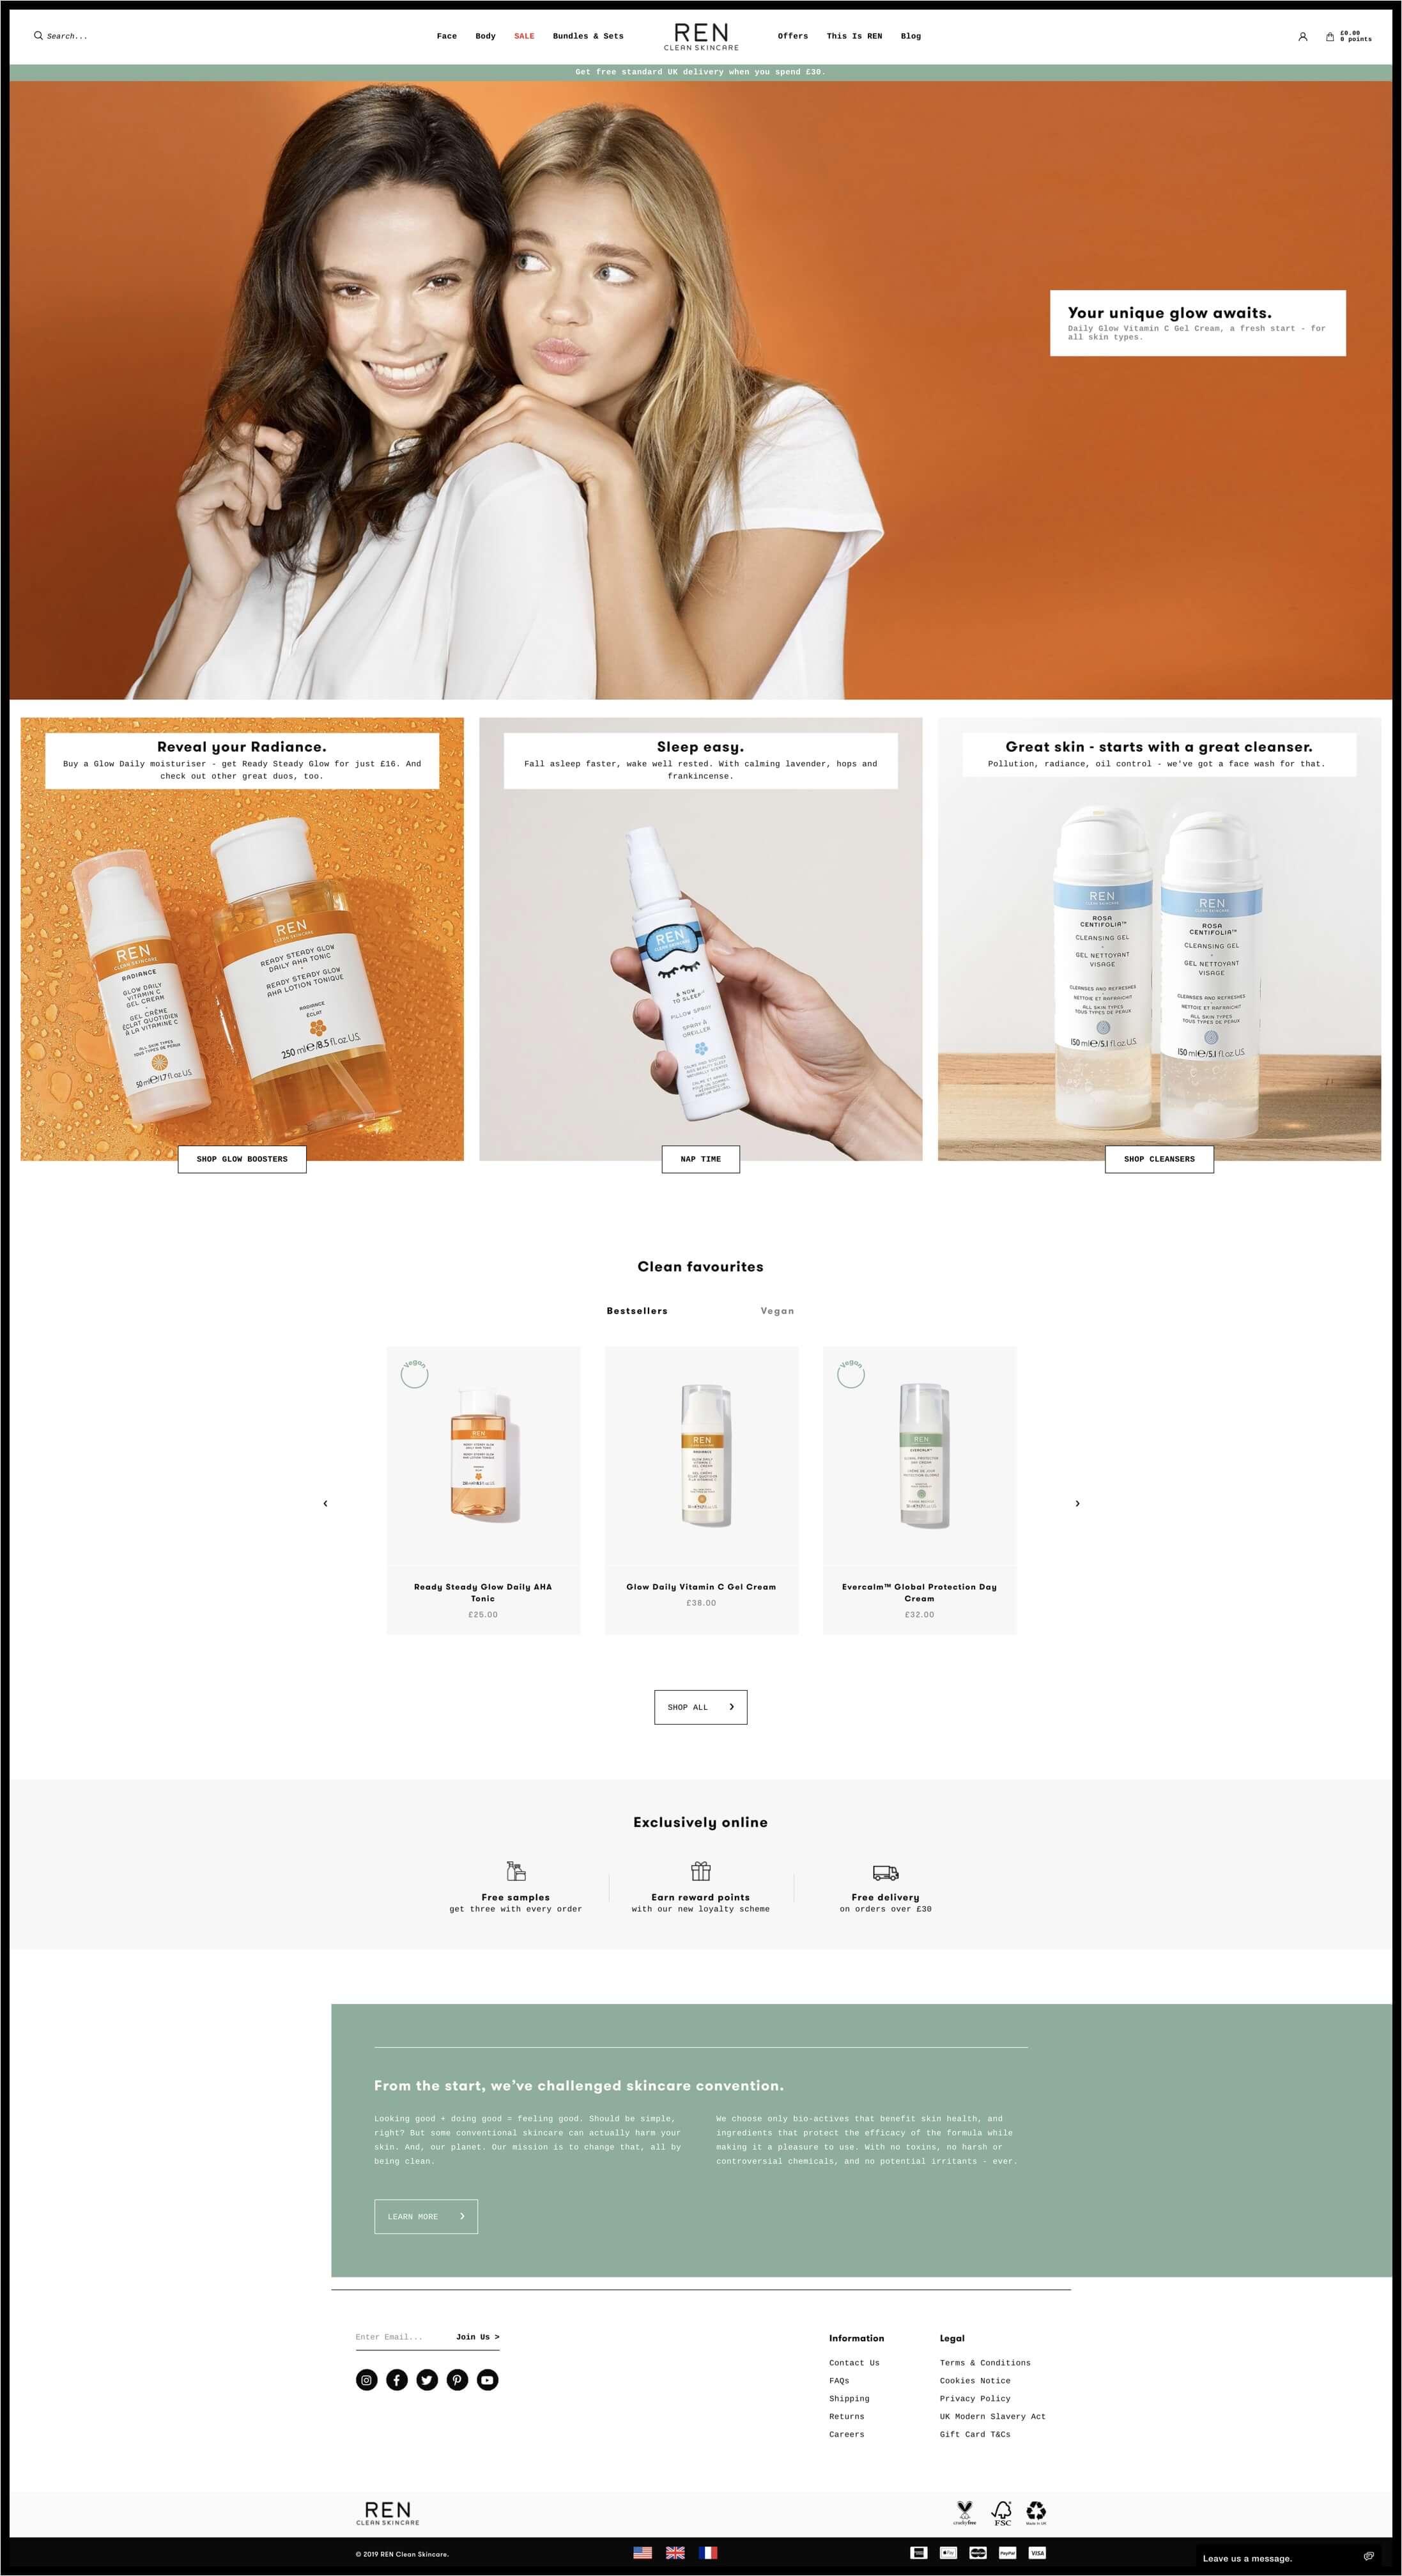 REN Skincare Desktop Image